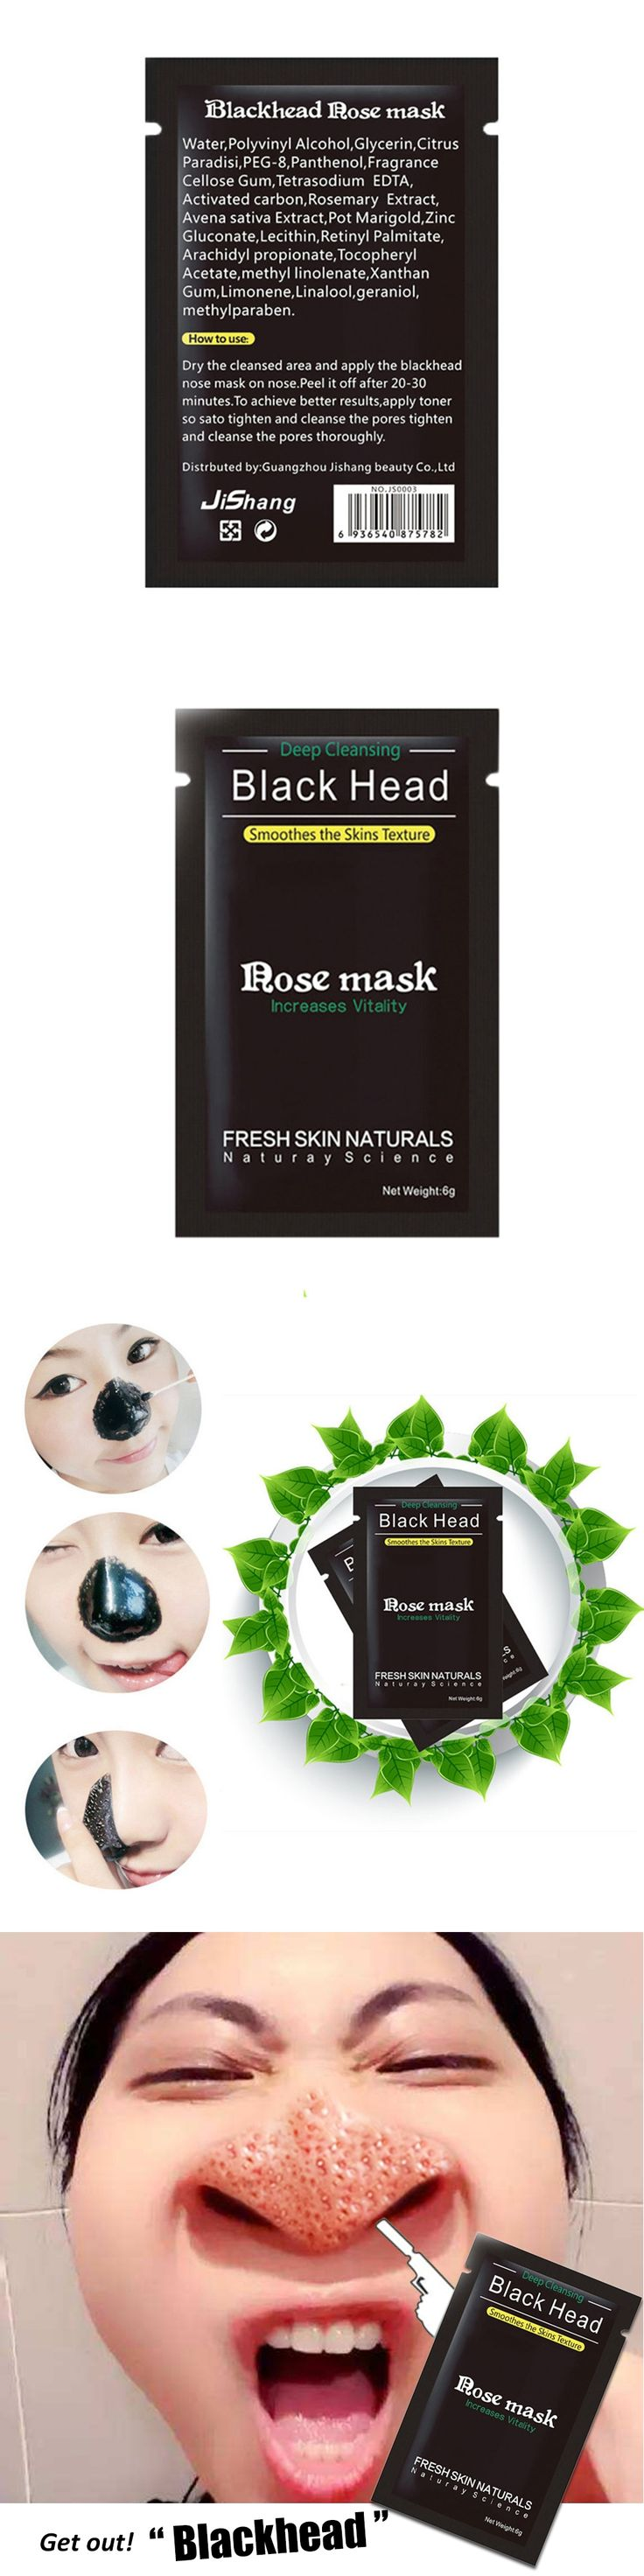 Black Mask Facial Mask Nose Blackhead Remover Peeling Peel Off Black Head Acne Treatments Face Care Suction  kniyea  kniyea